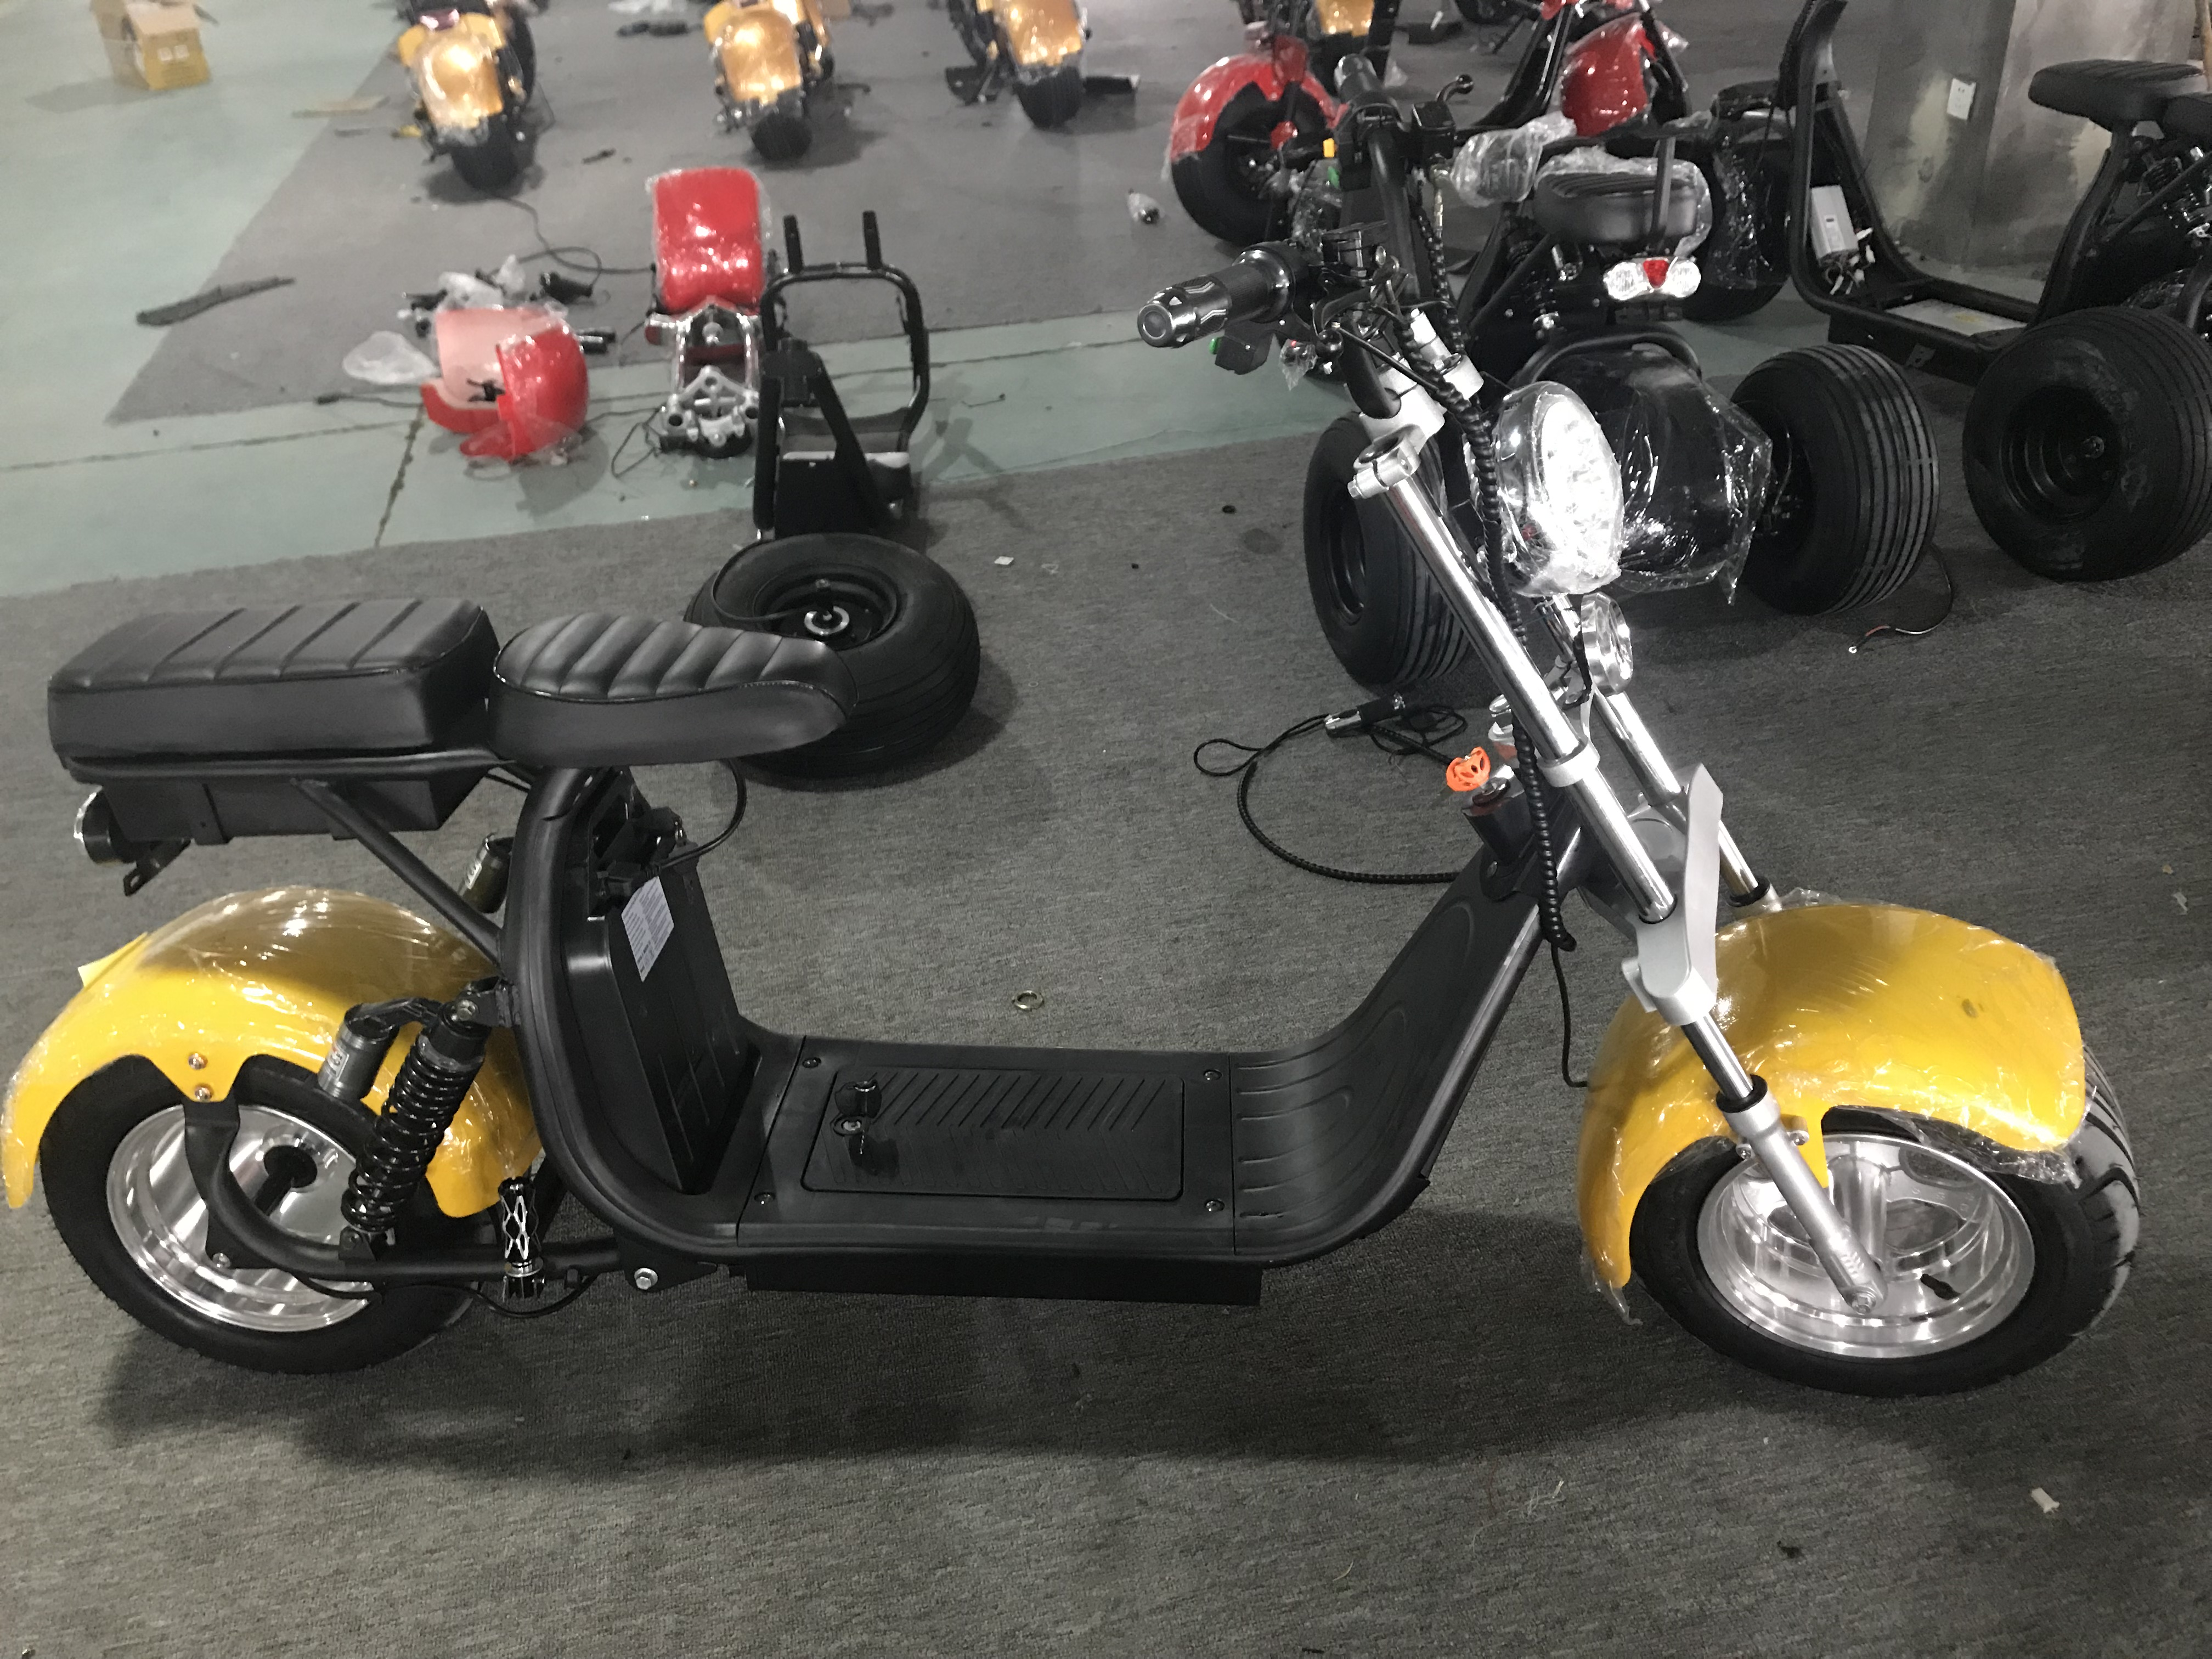 Sc11 + 10 pollici grande pneumatico 1500 w 60 v 20ah removbale batteria citycoco off road scooter elettrico nave da usa- holland